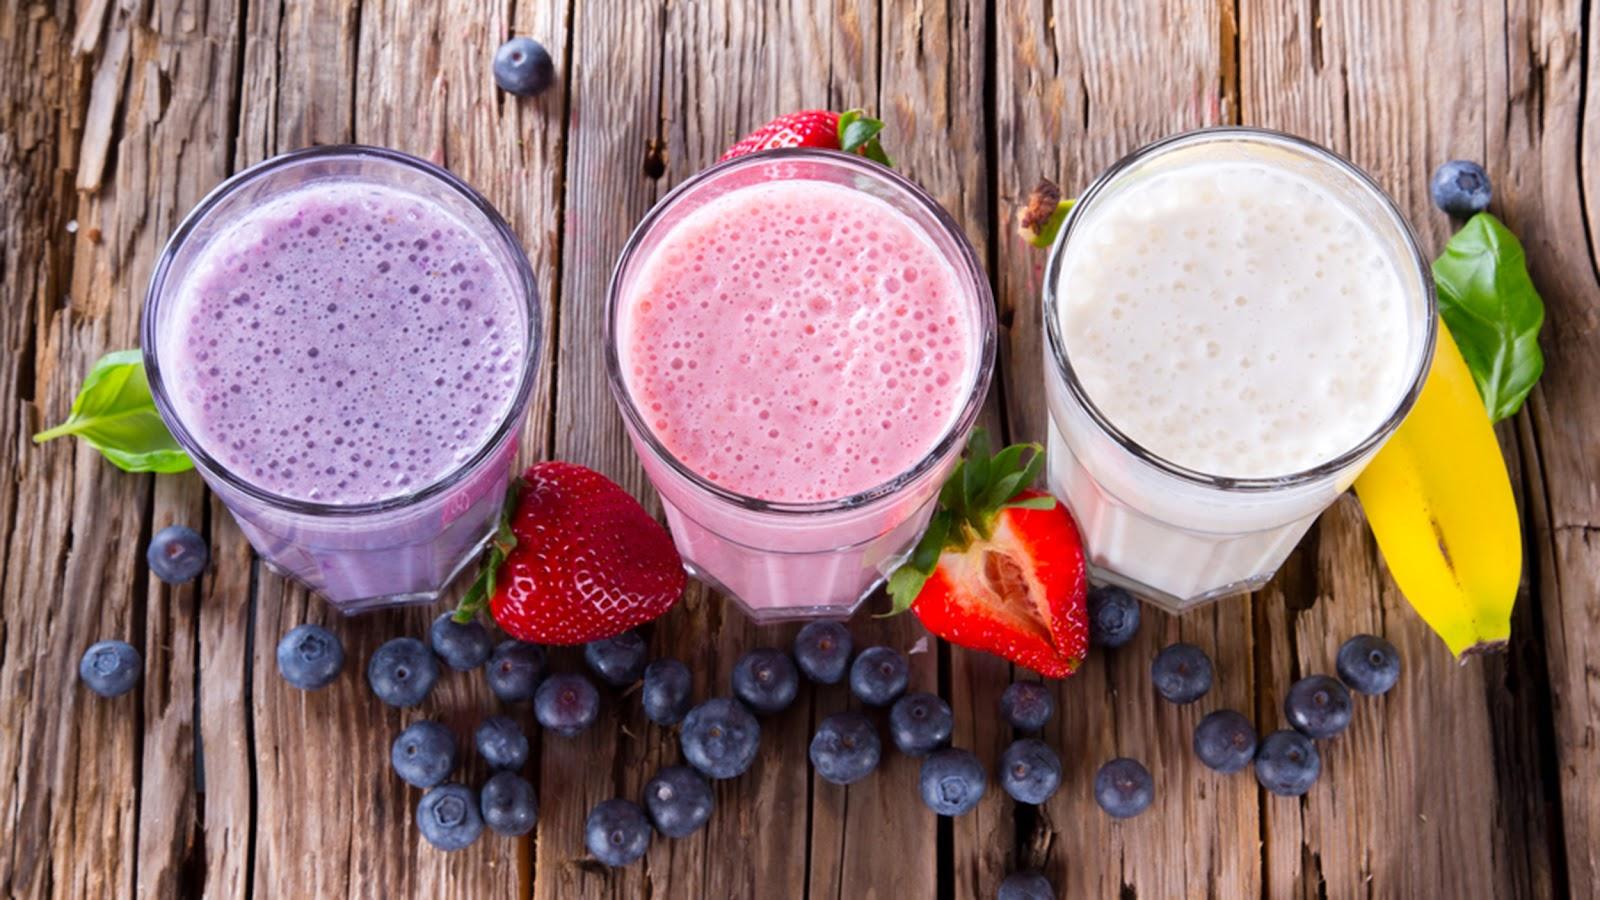 fruit-smoothies-today-tease-1-150805_f1b20de057704b0707570a6613e1f25a.jpg